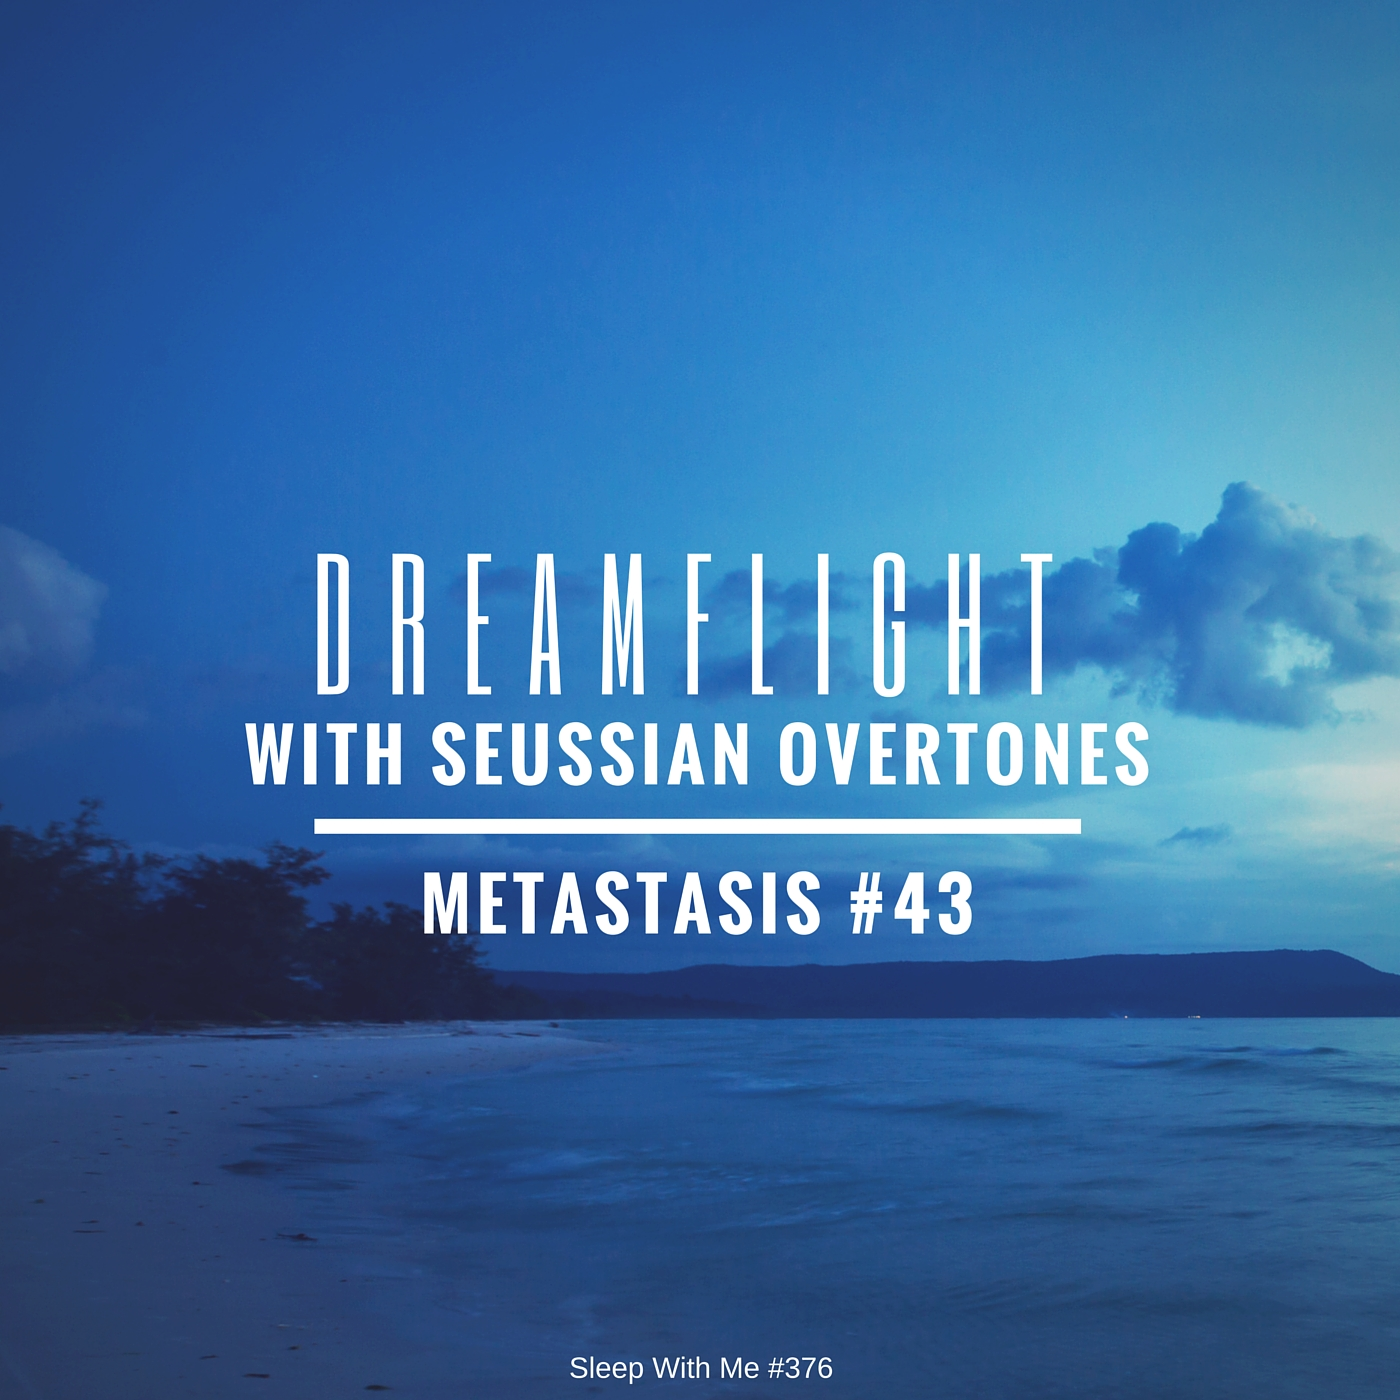 Dreamflight | Metastasis #43 | Sleep With Me #376